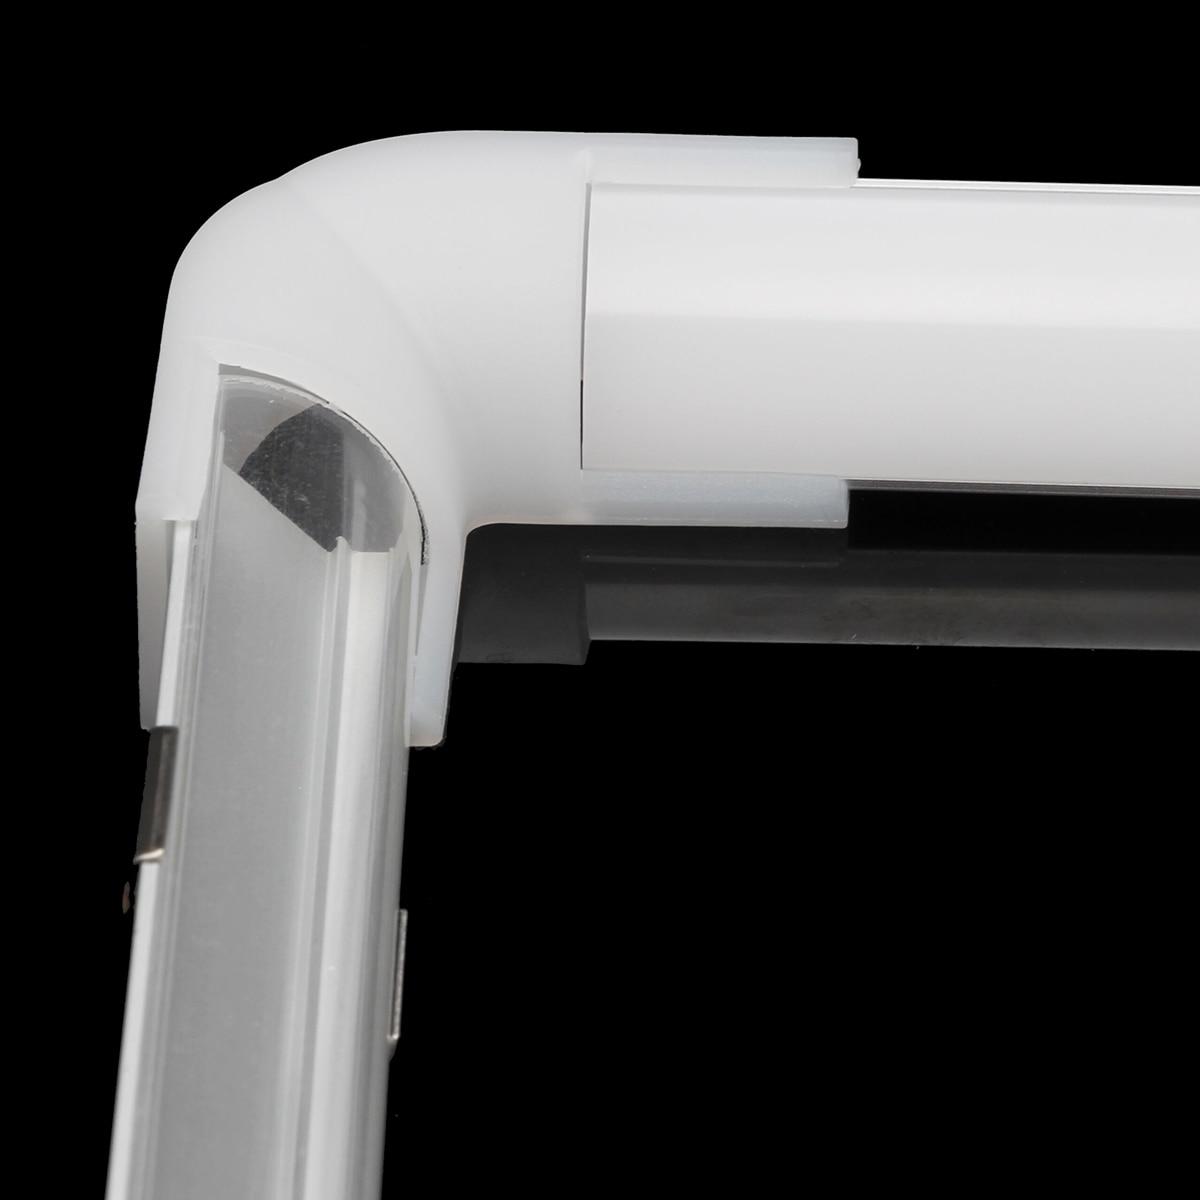 90 Degree Corner Connector Led Corner Aluminium Profile Link 16*16mm Profile Joint